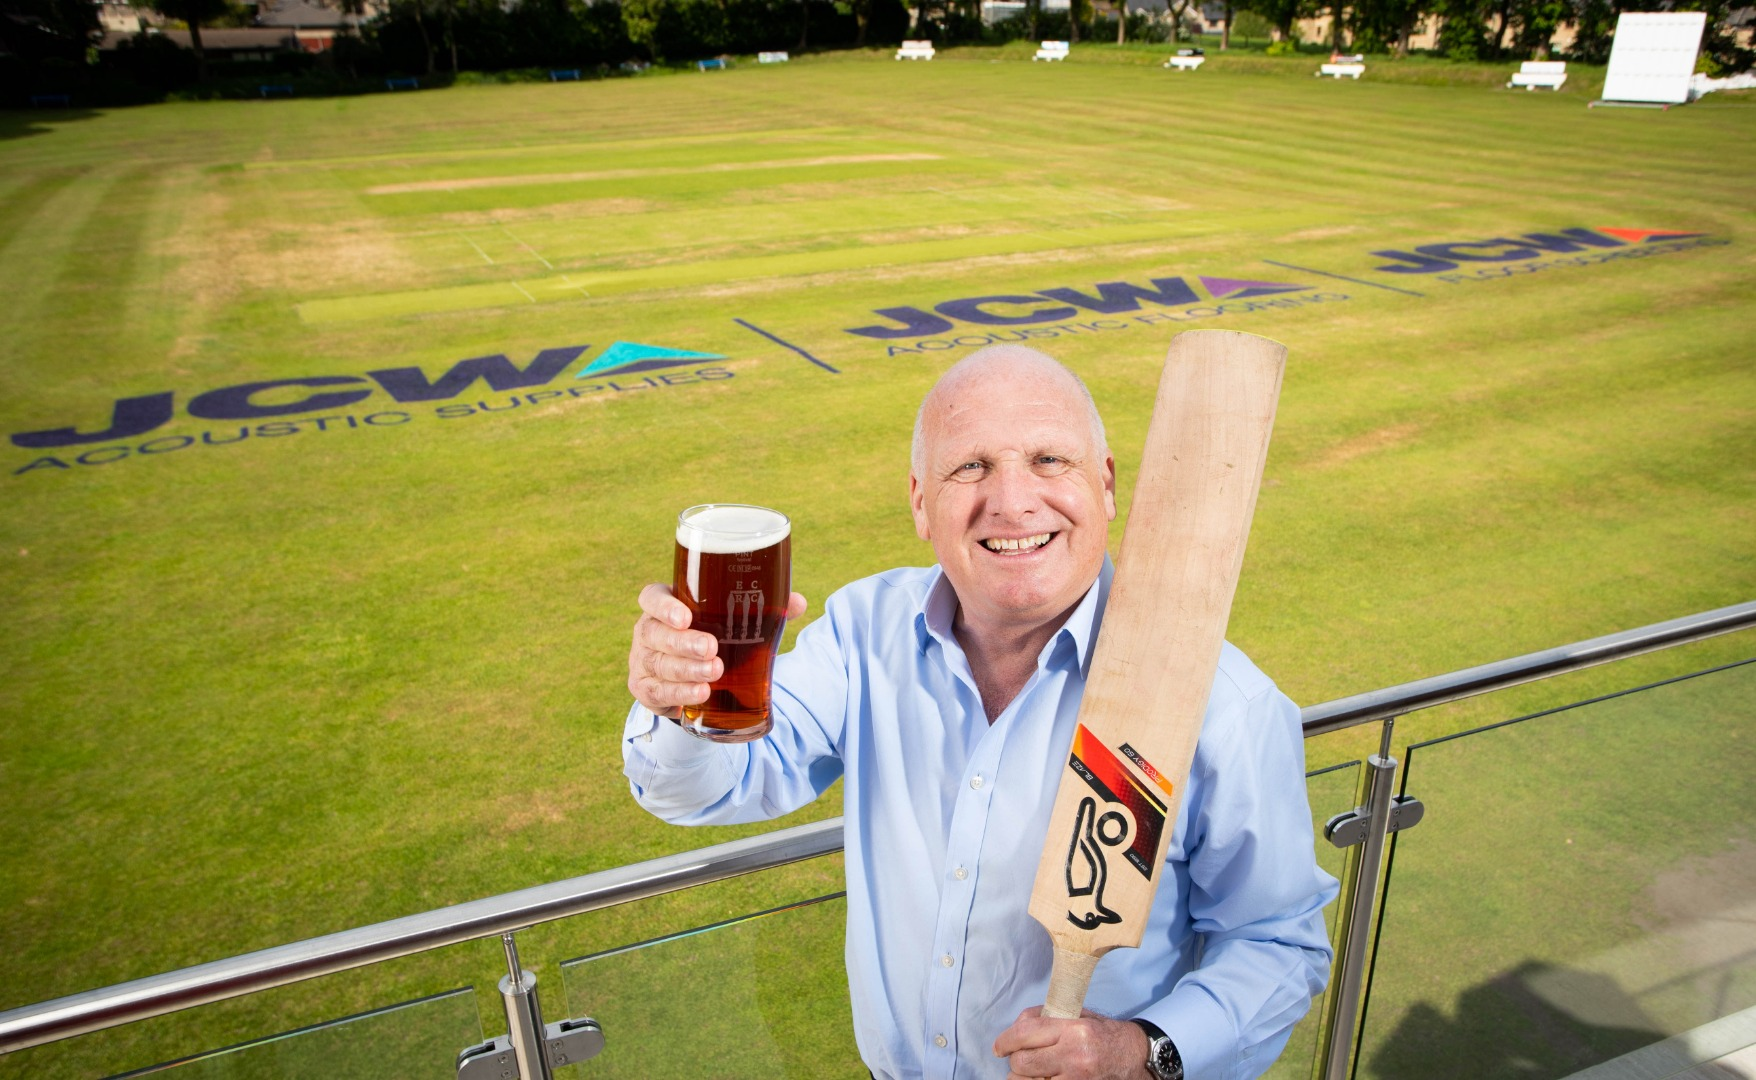 JCW sponsors community cricket club beer festival